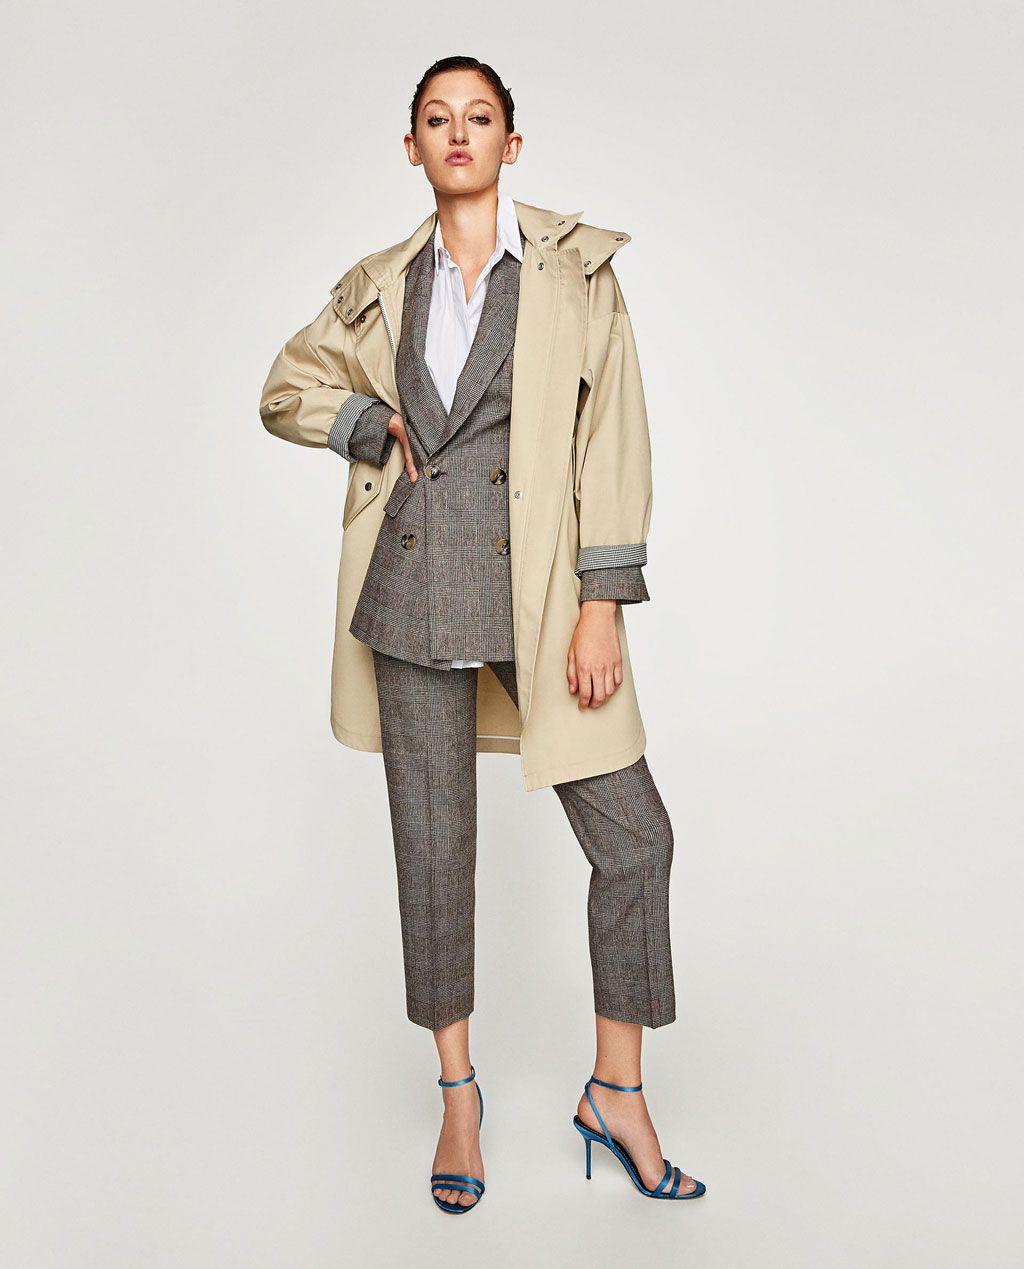 Perlen jacket zara